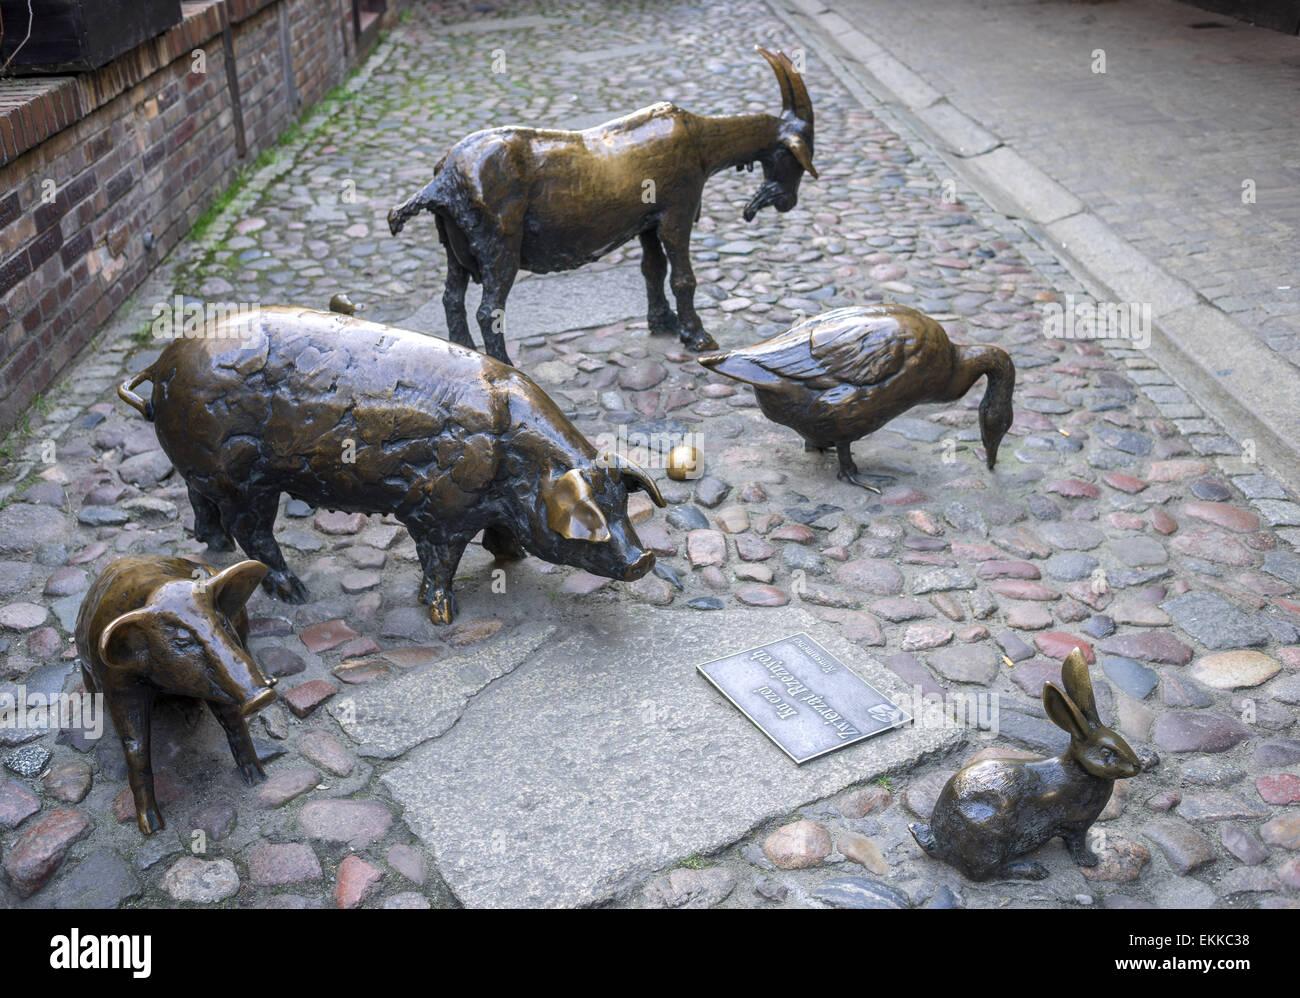 Monument to commemorate slaughtered farm animals Jatki Wroclaw Poland - Stock Image